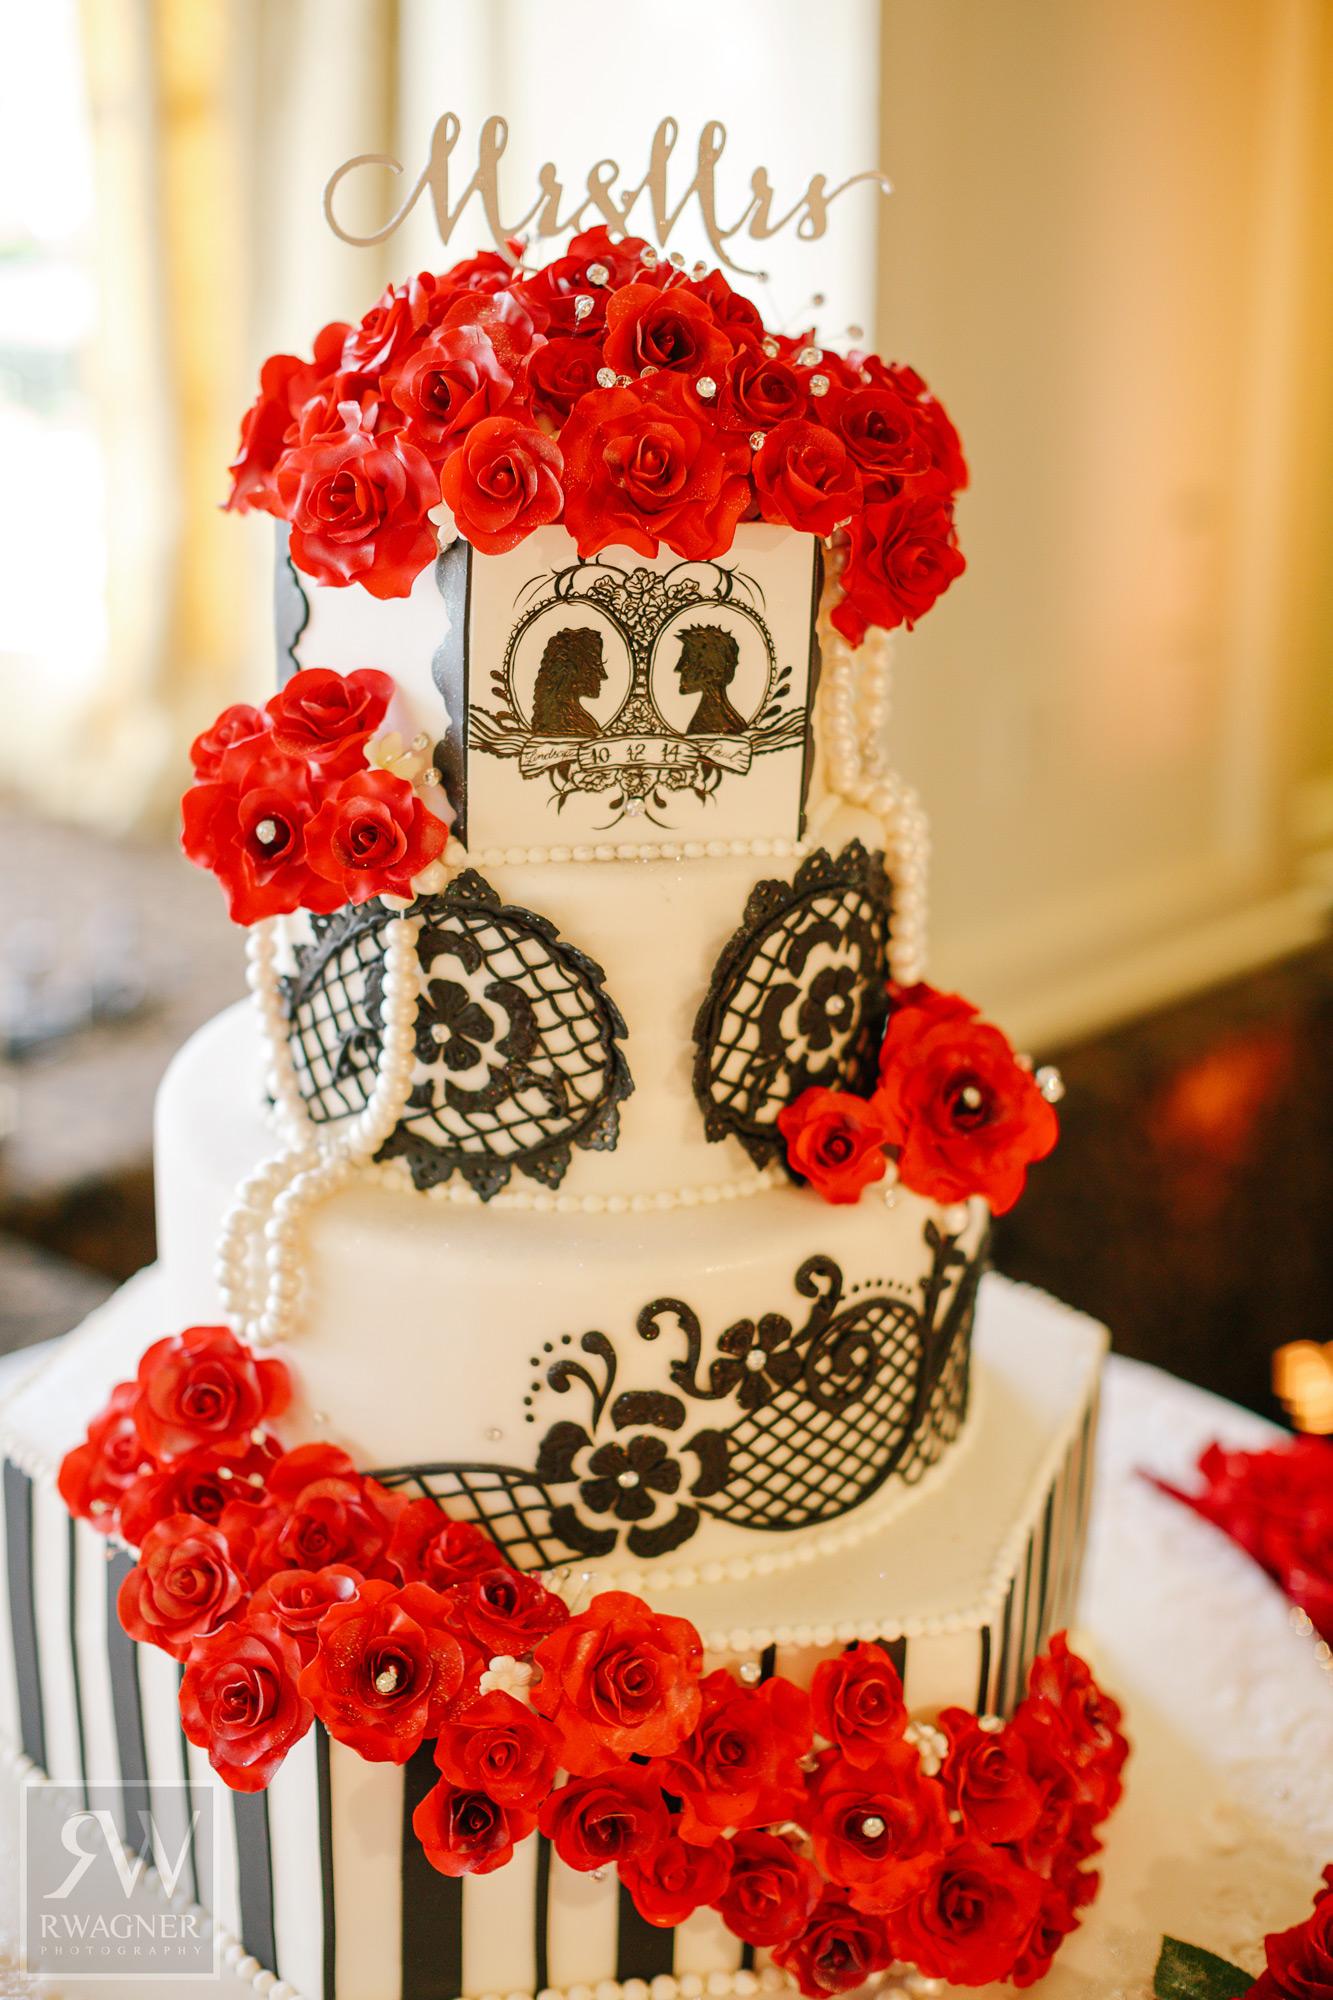 ceci_new_york_luxury_wedding_invitations_couture_red_black_white_real_wedding_dramatic_inn_at_longshore_v286_28.jpg